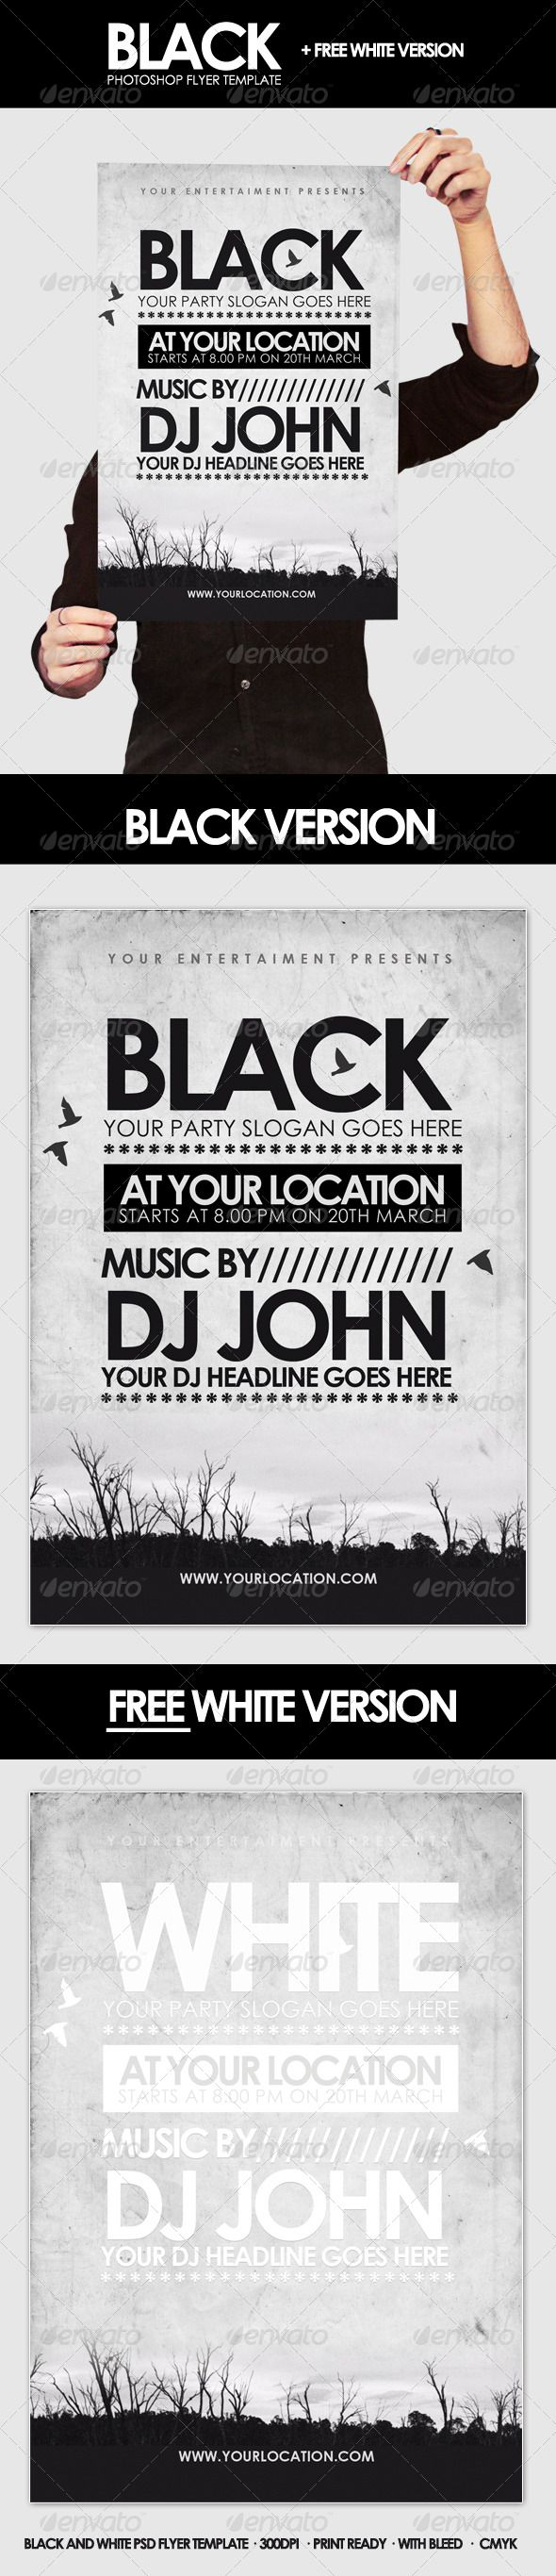 Black Flyer Template – Black Flyer Template